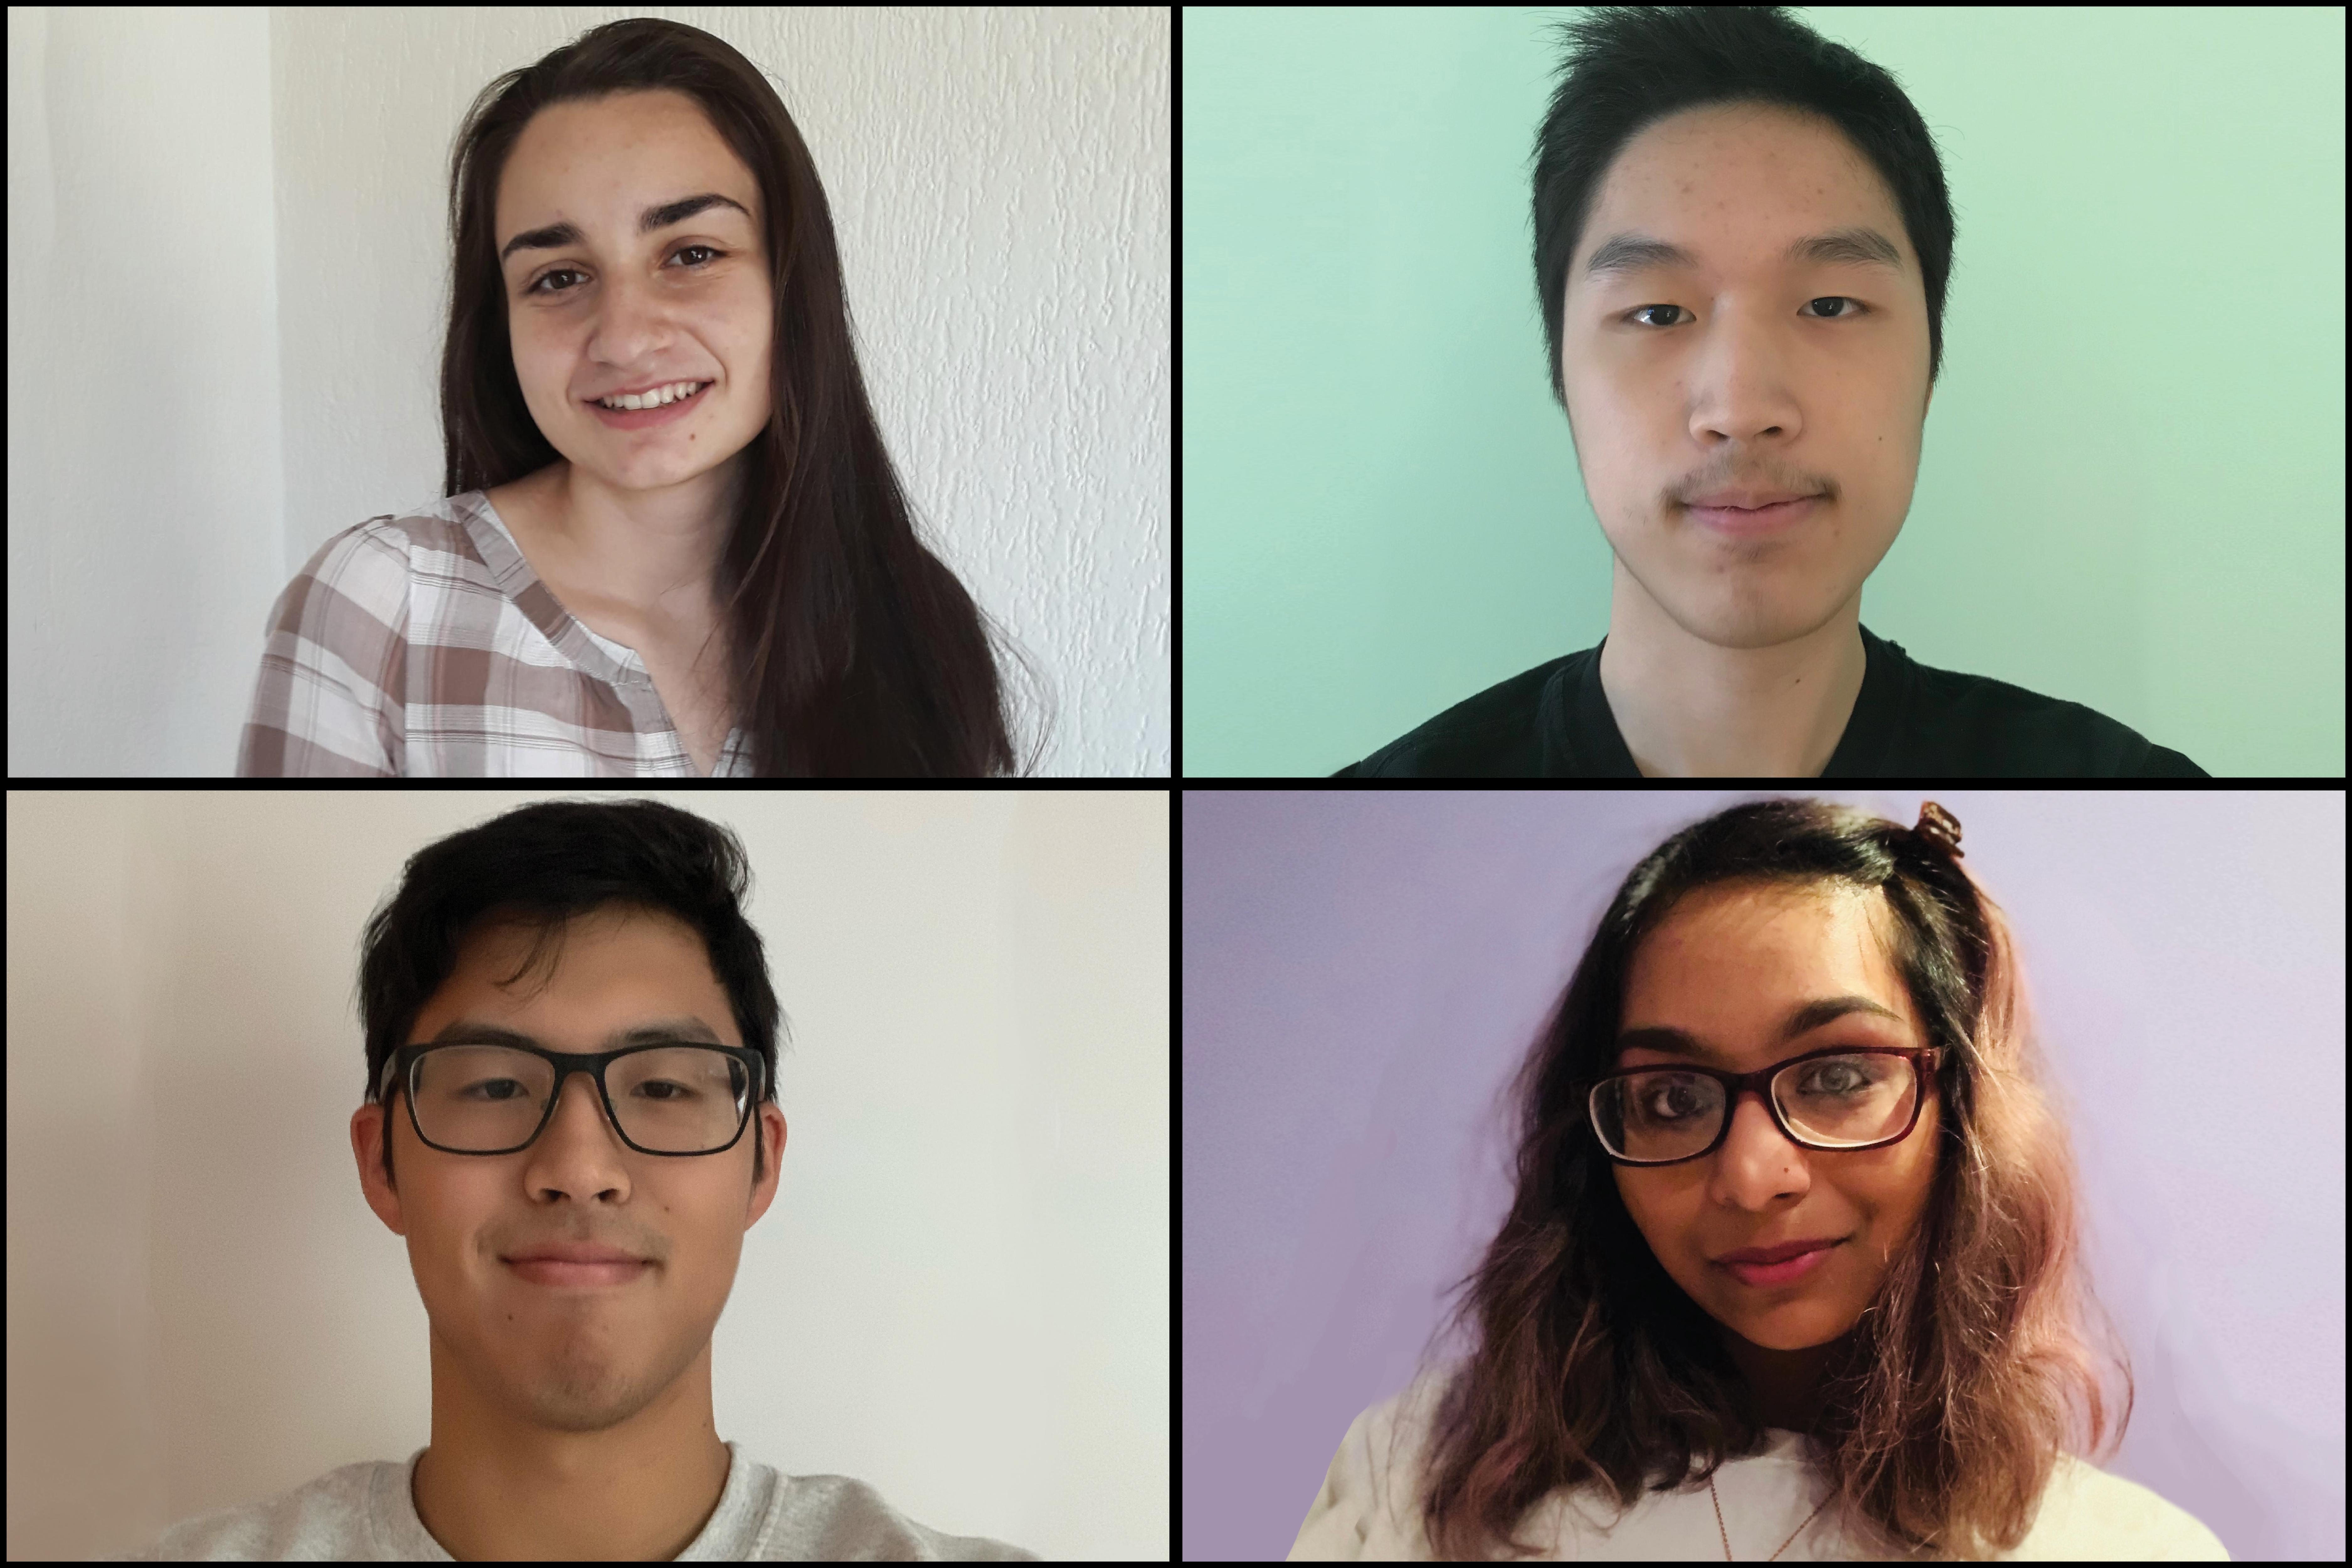 MIT undergraduates pursue research opportunities through the pandemic